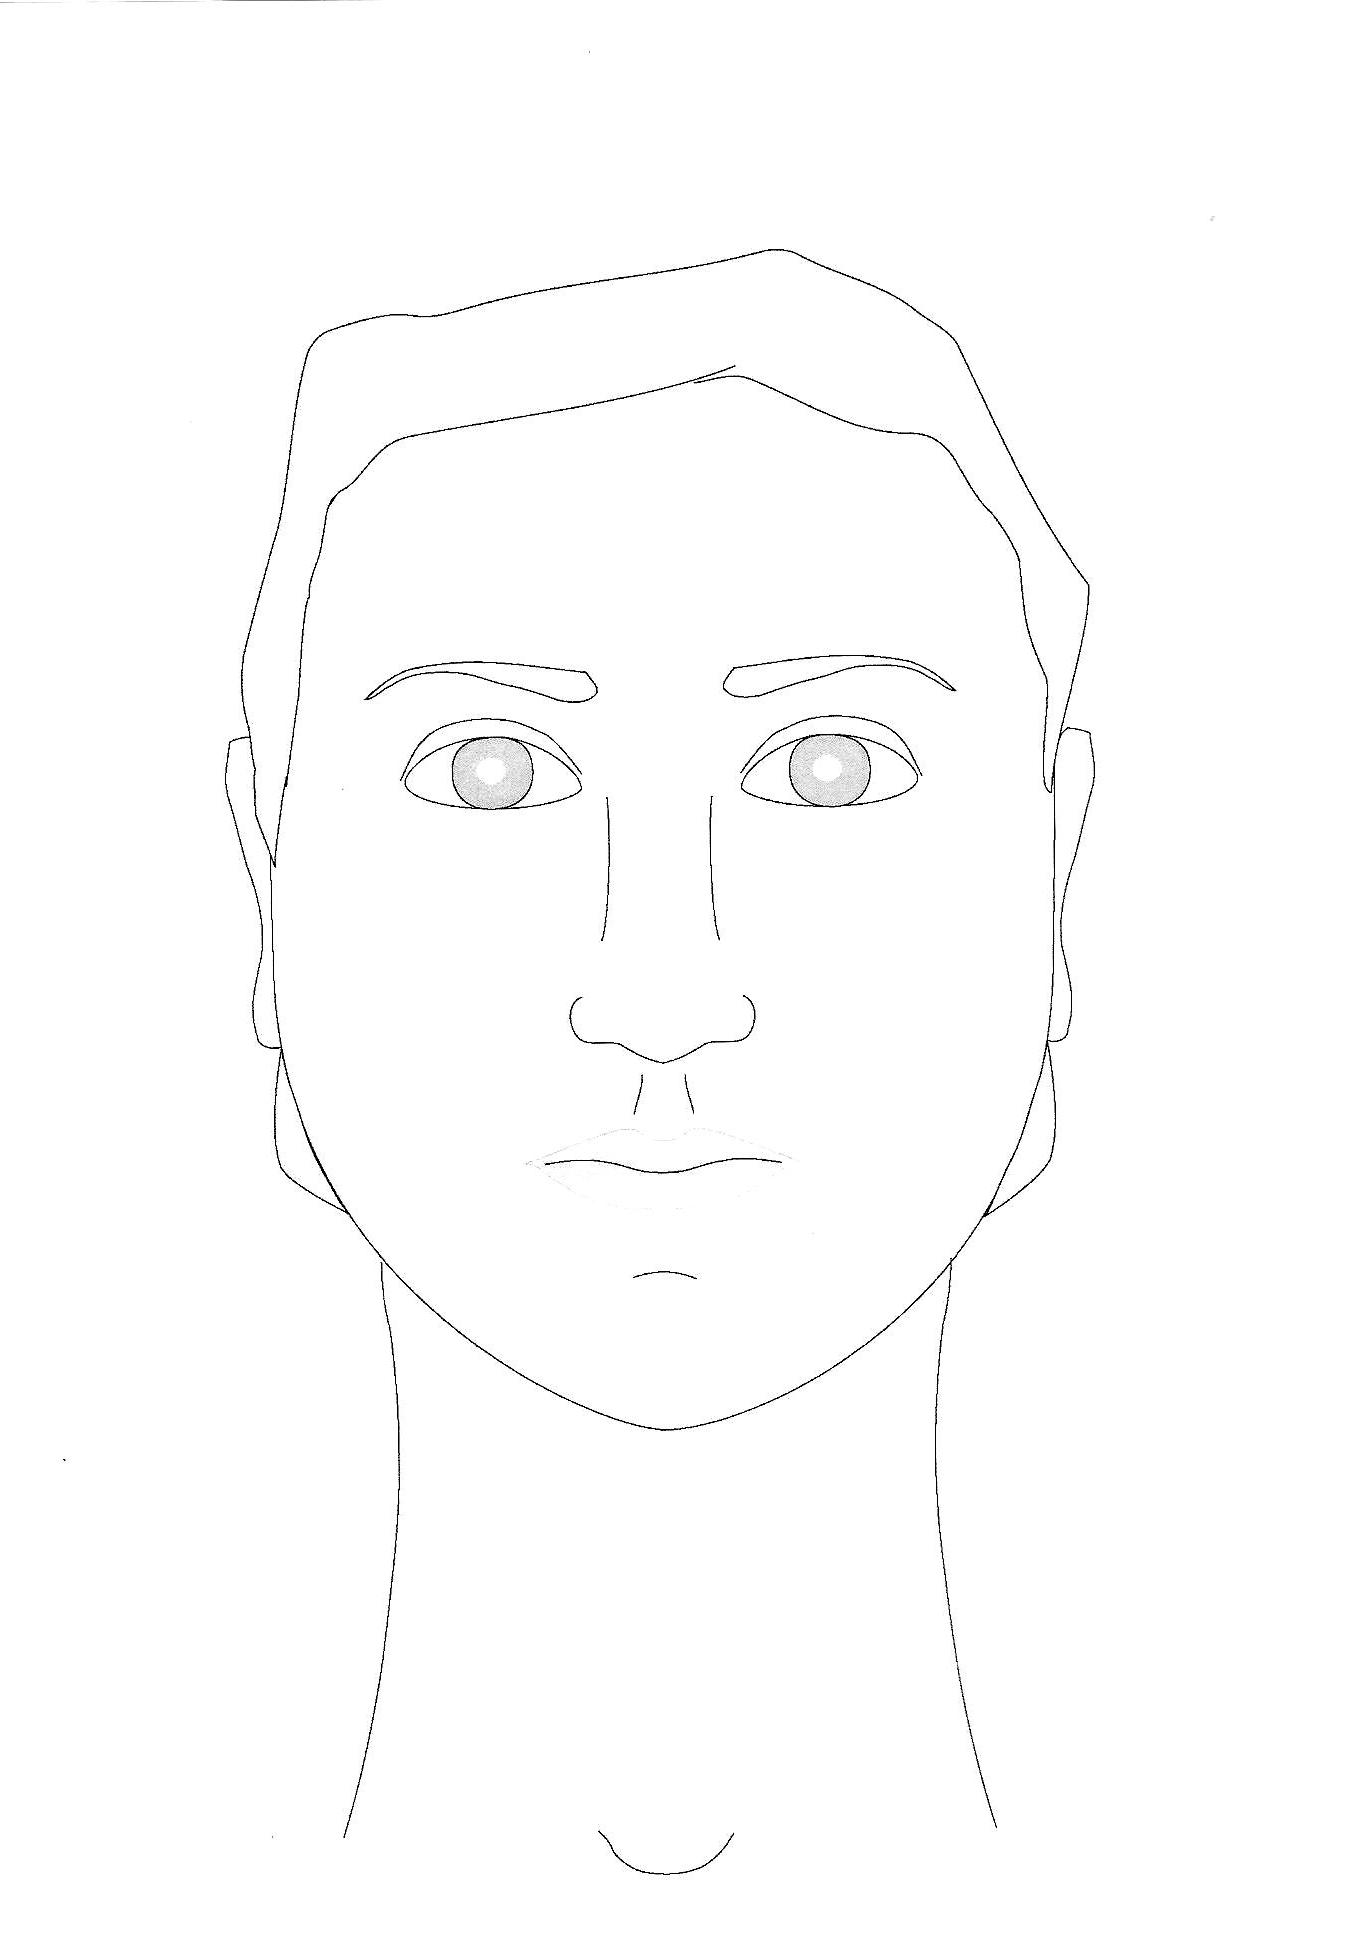 Ben Townsend Acupuncture Patient Forms